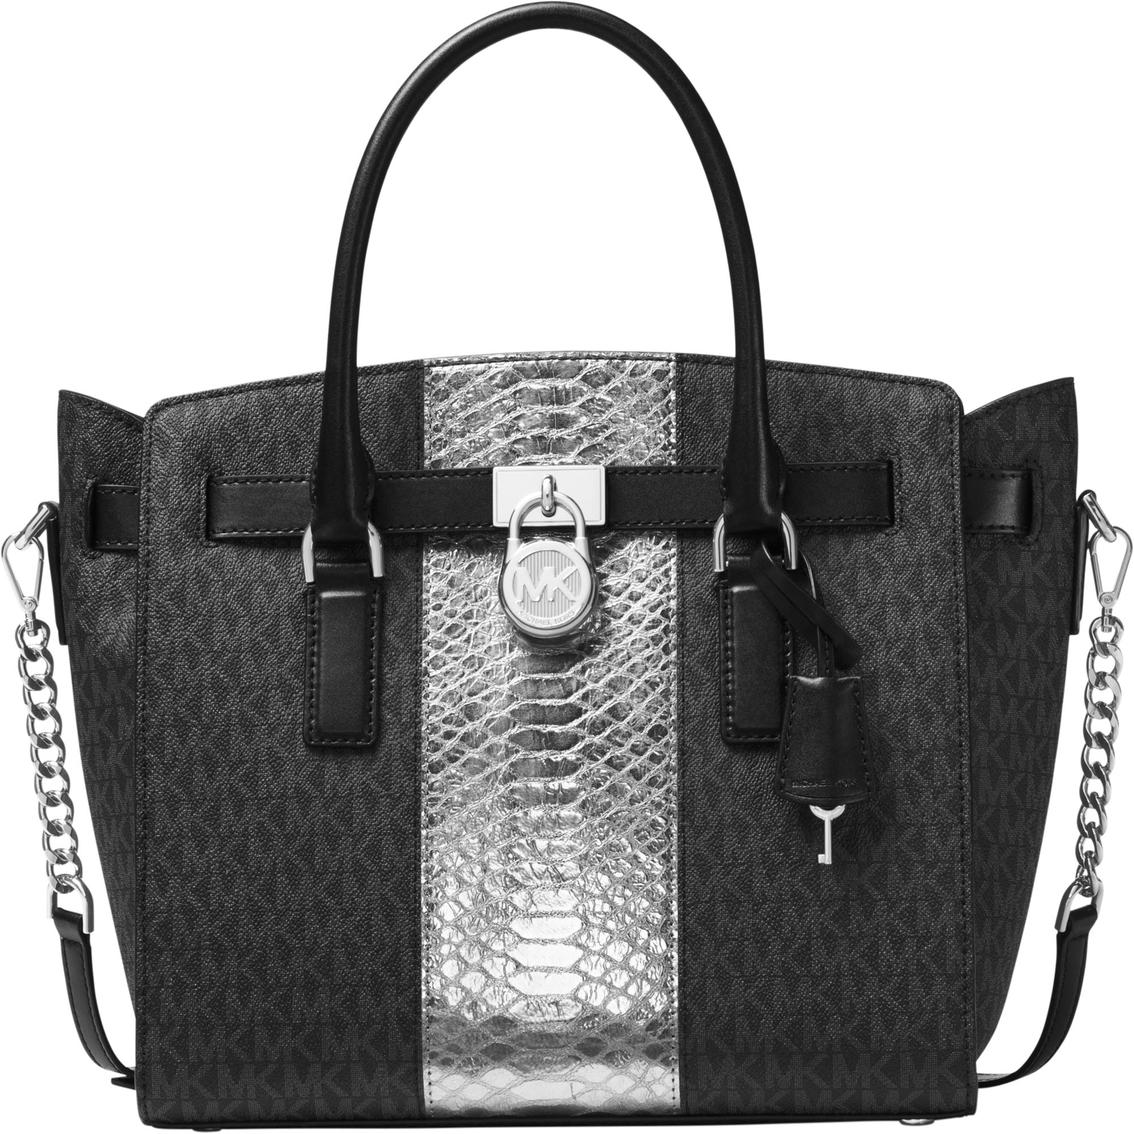 ef0dfb9b953f Michael Kors Hamilton Large East West Satchel | Handbags | Shop The ...